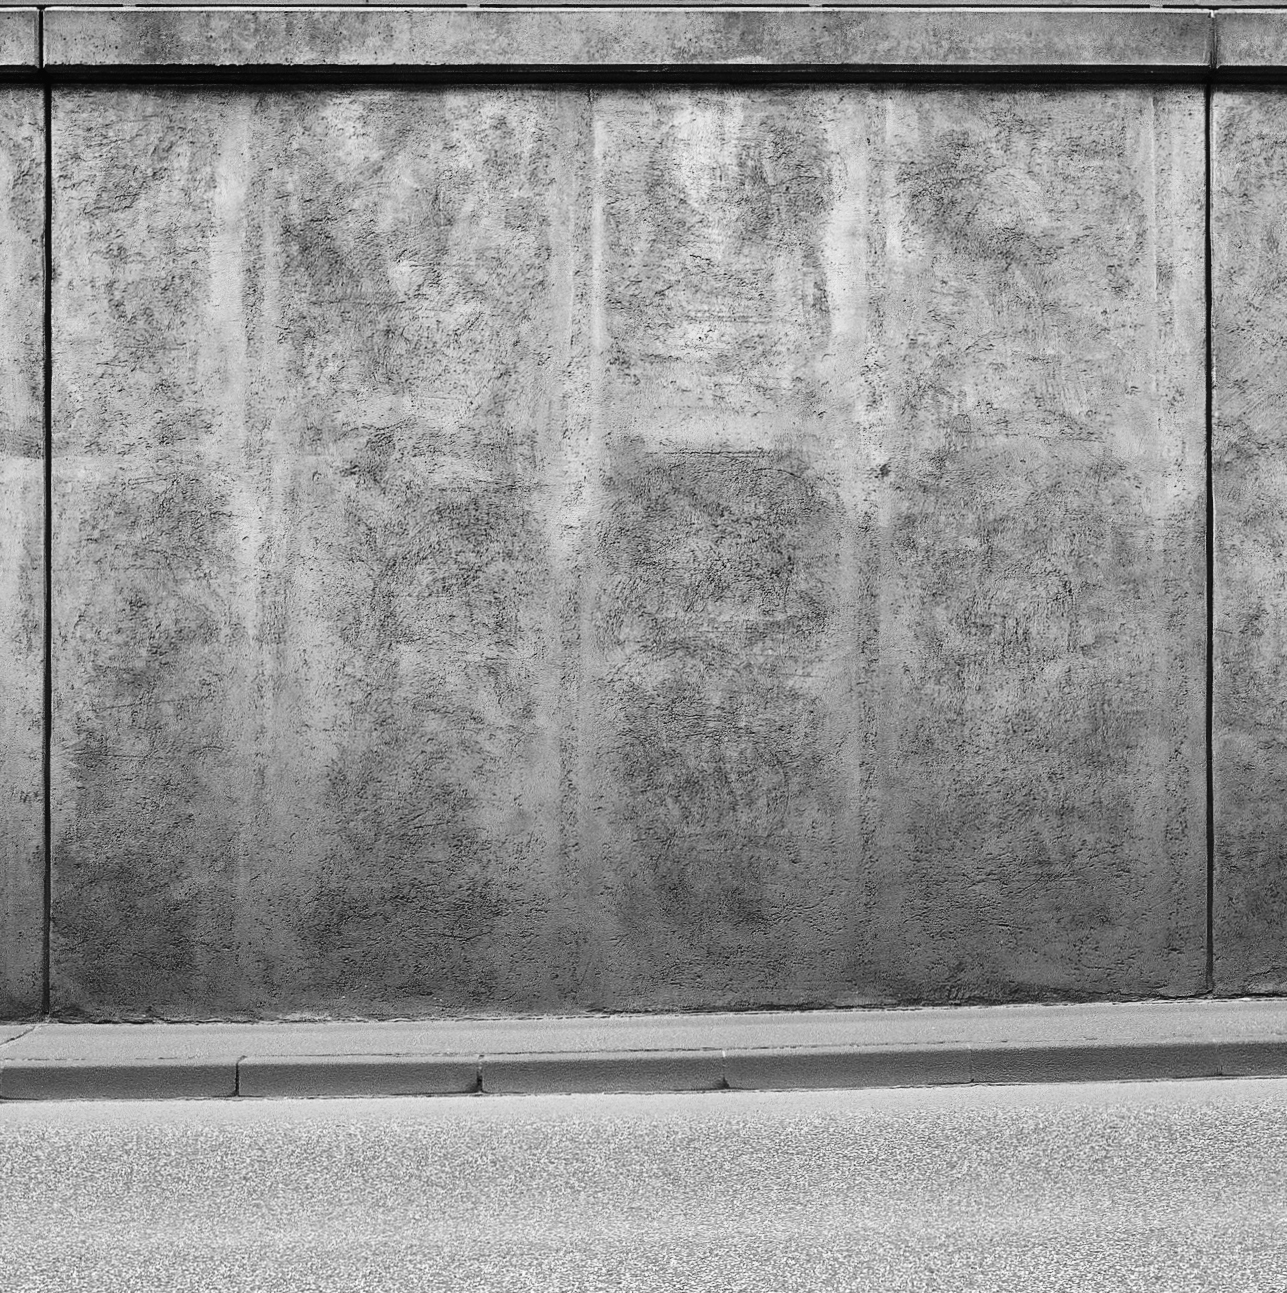 Ossian Fraser Untitled (Tunnel Alexanderplatz), 2016